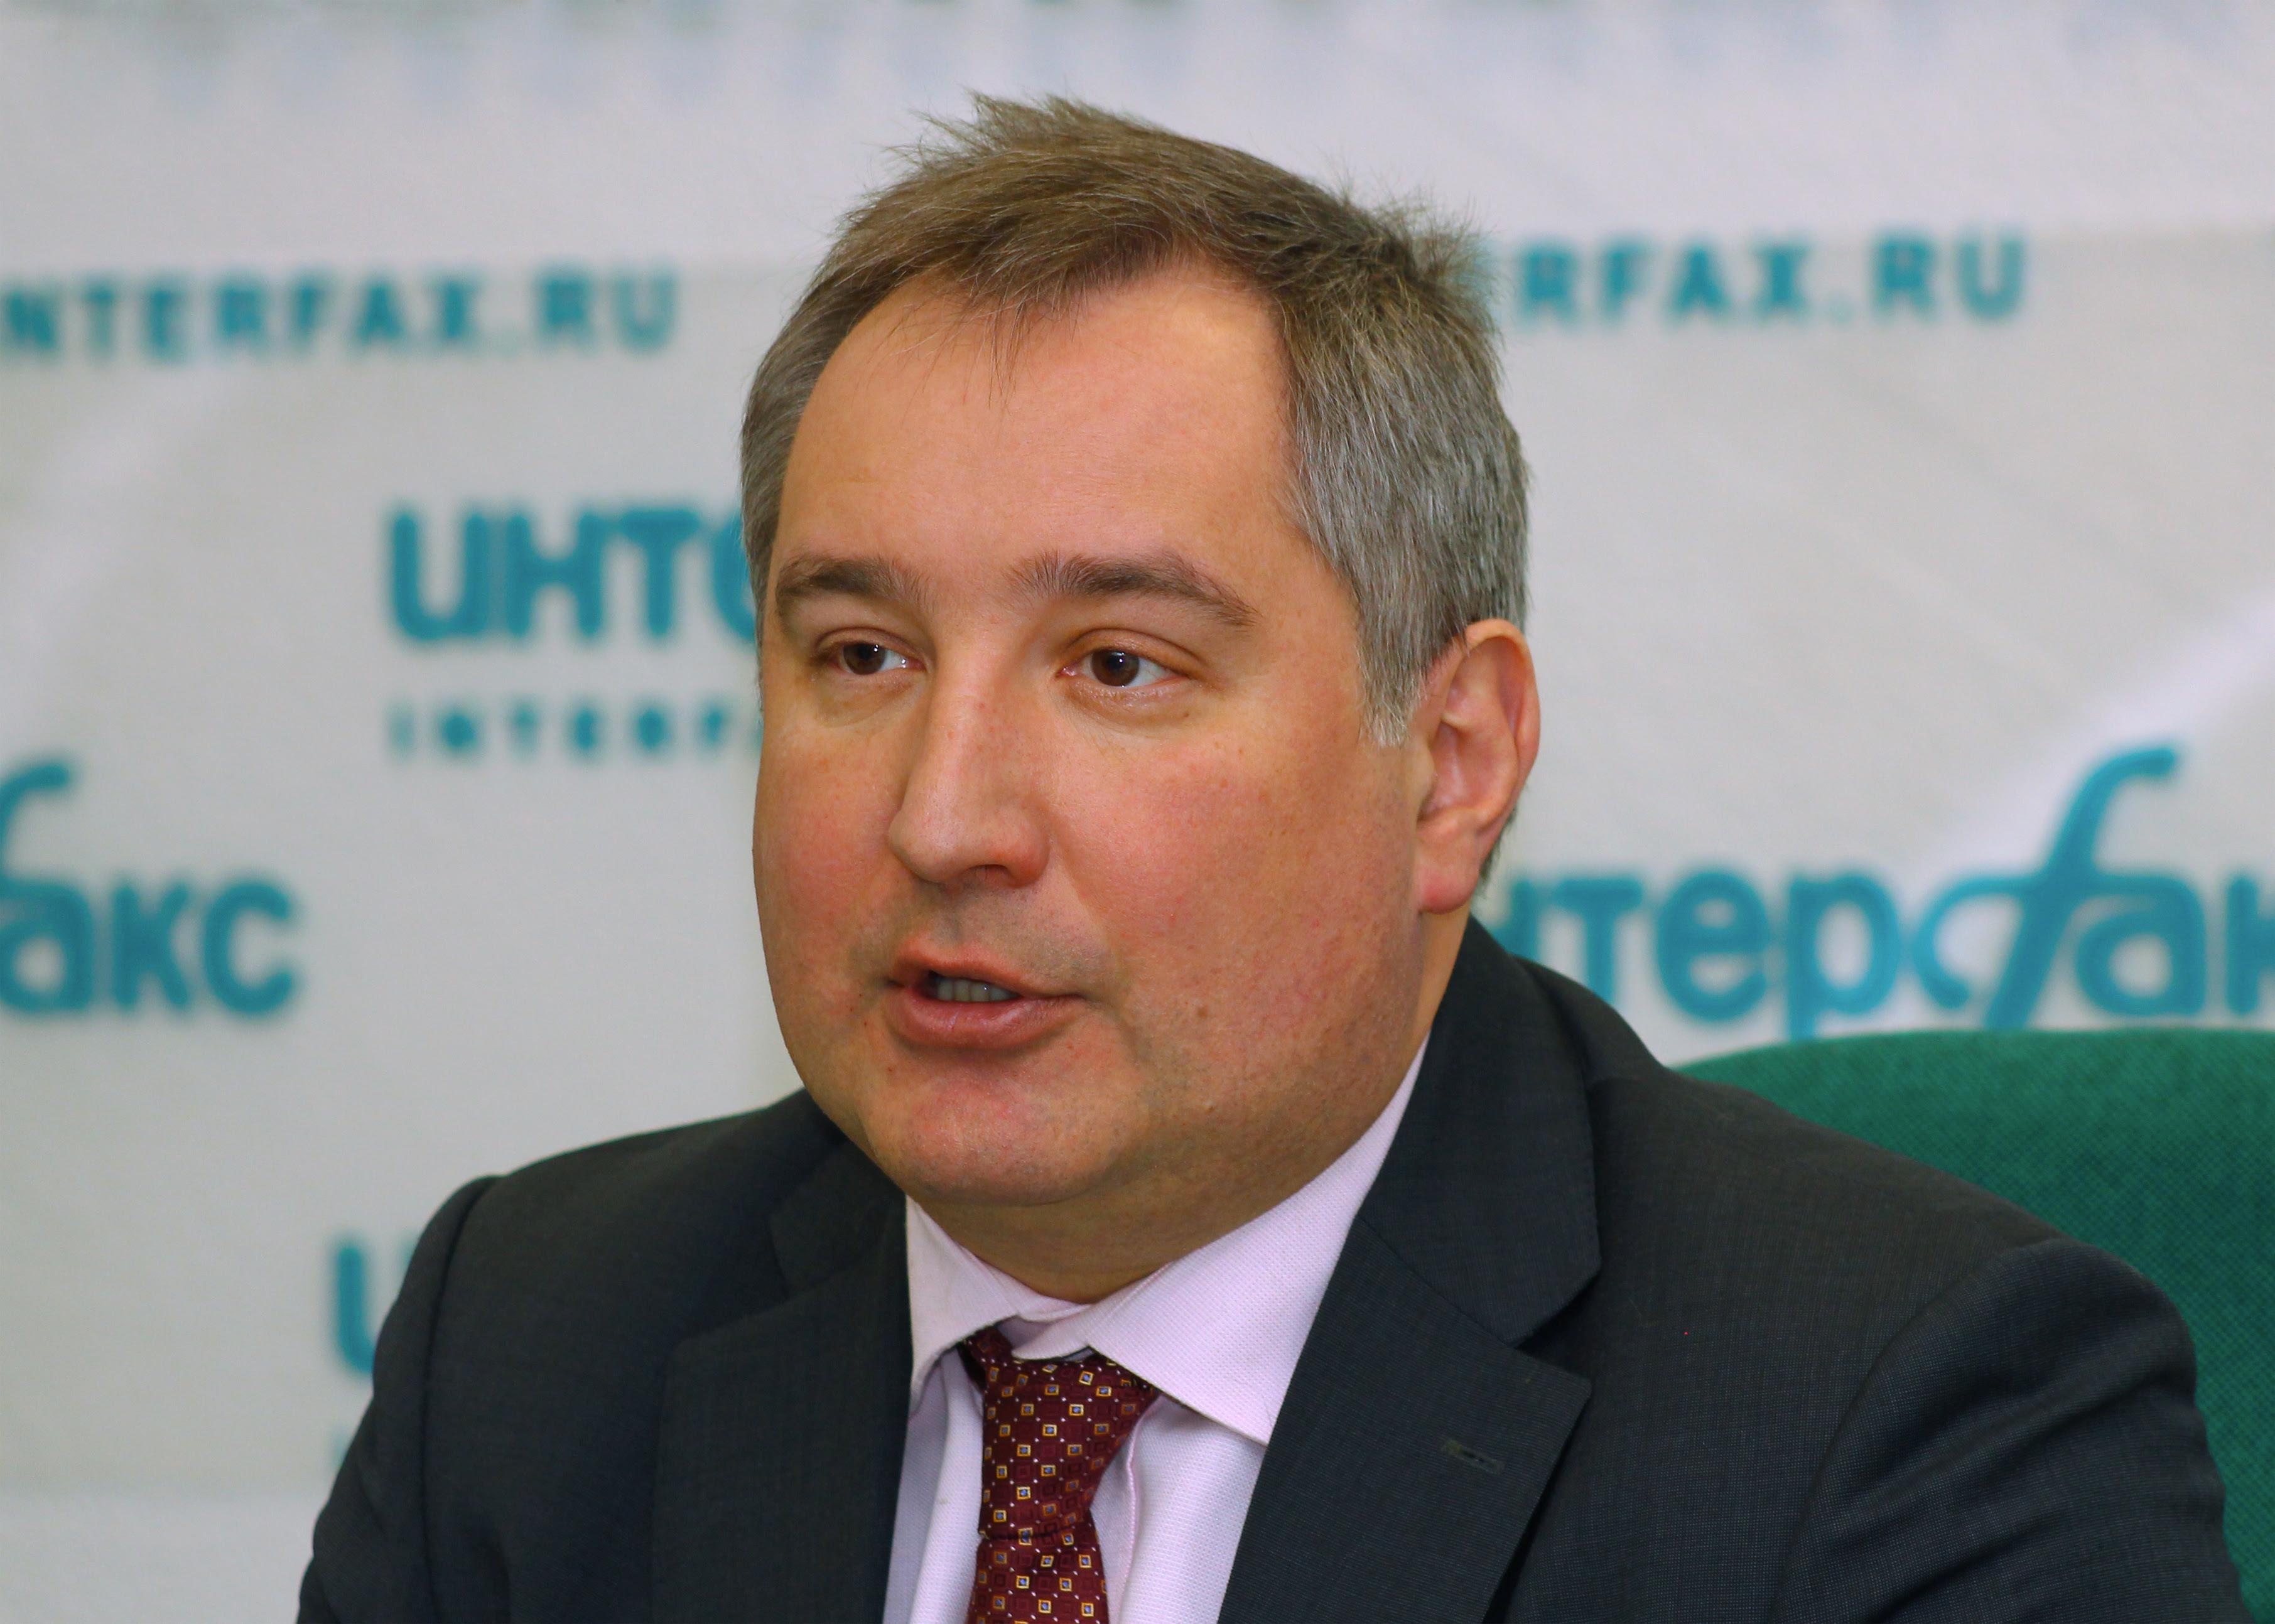 http://upload.wikimedia.org/wikipedia/commons/2/2b/Dmitry_Rogozin_Moscow_Interfax_02-2011.jpg